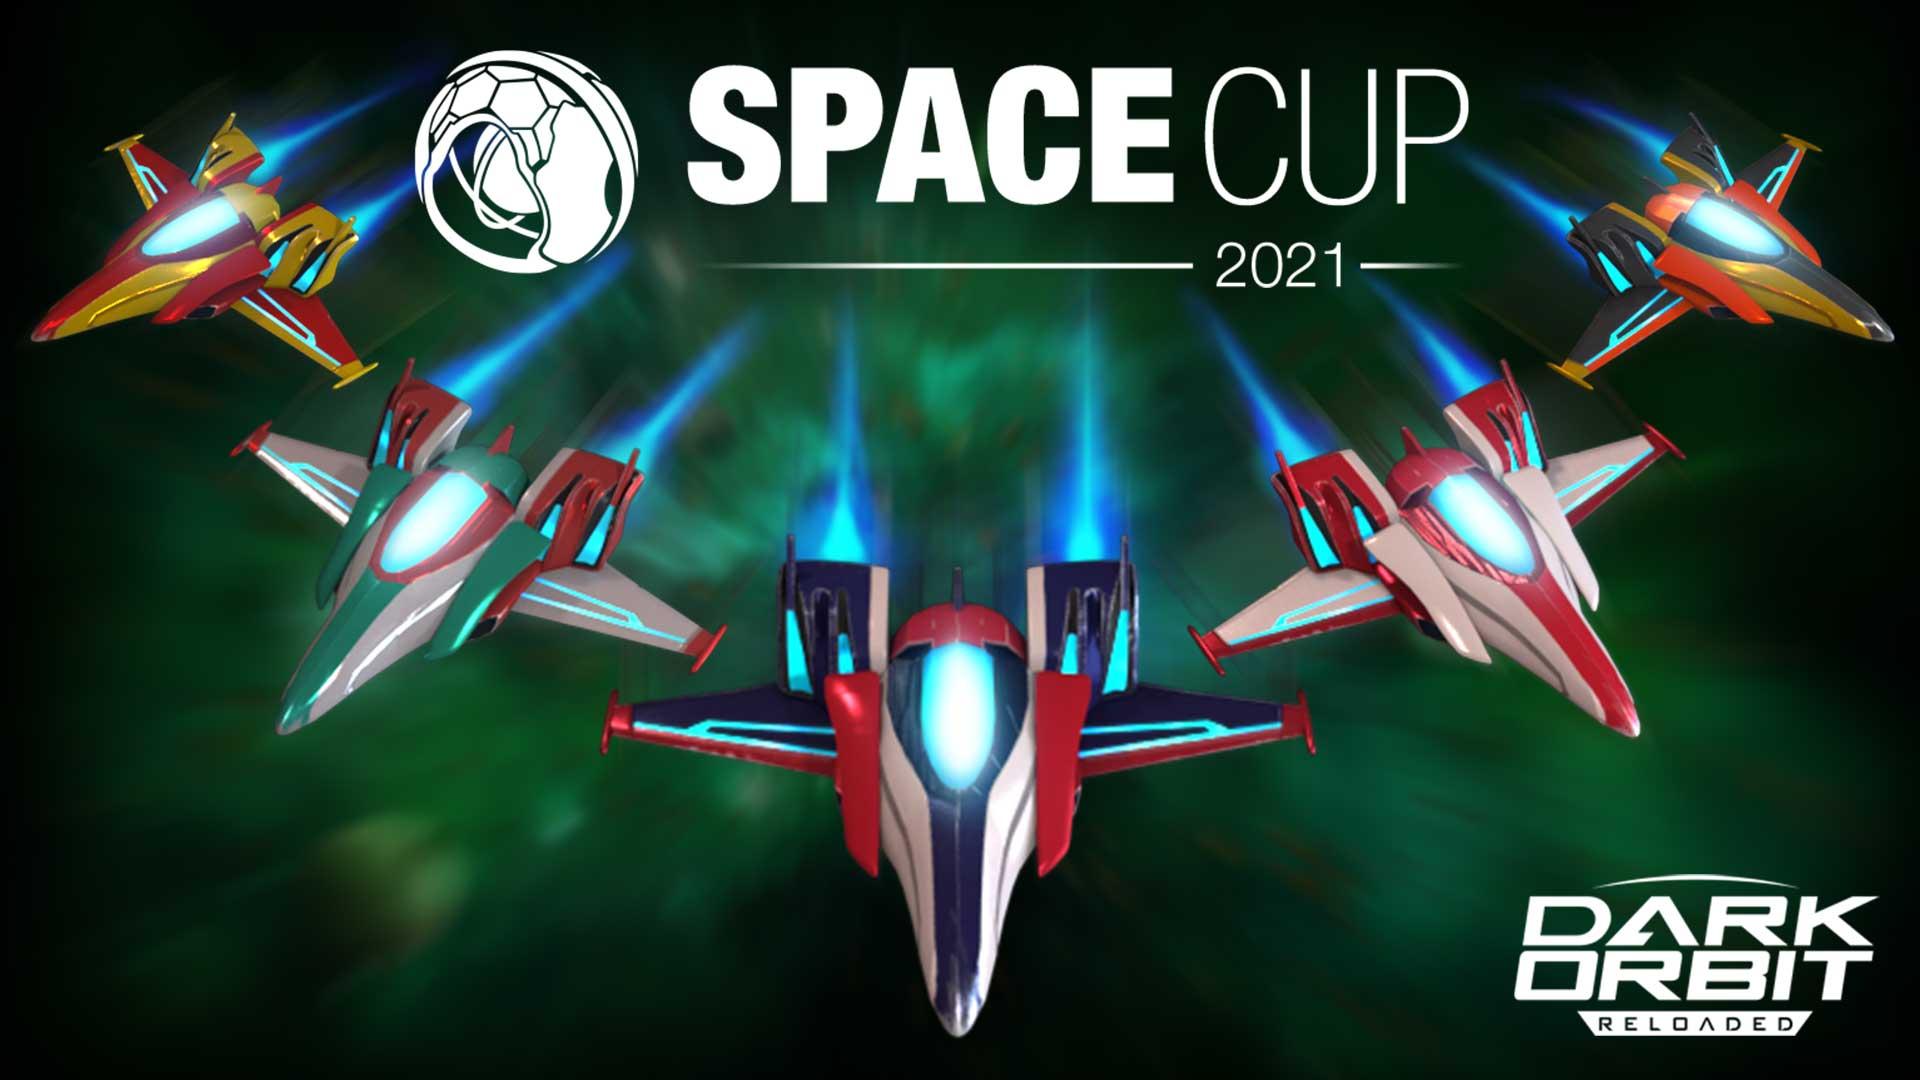 DO_marketing_spacecup202106.jpg